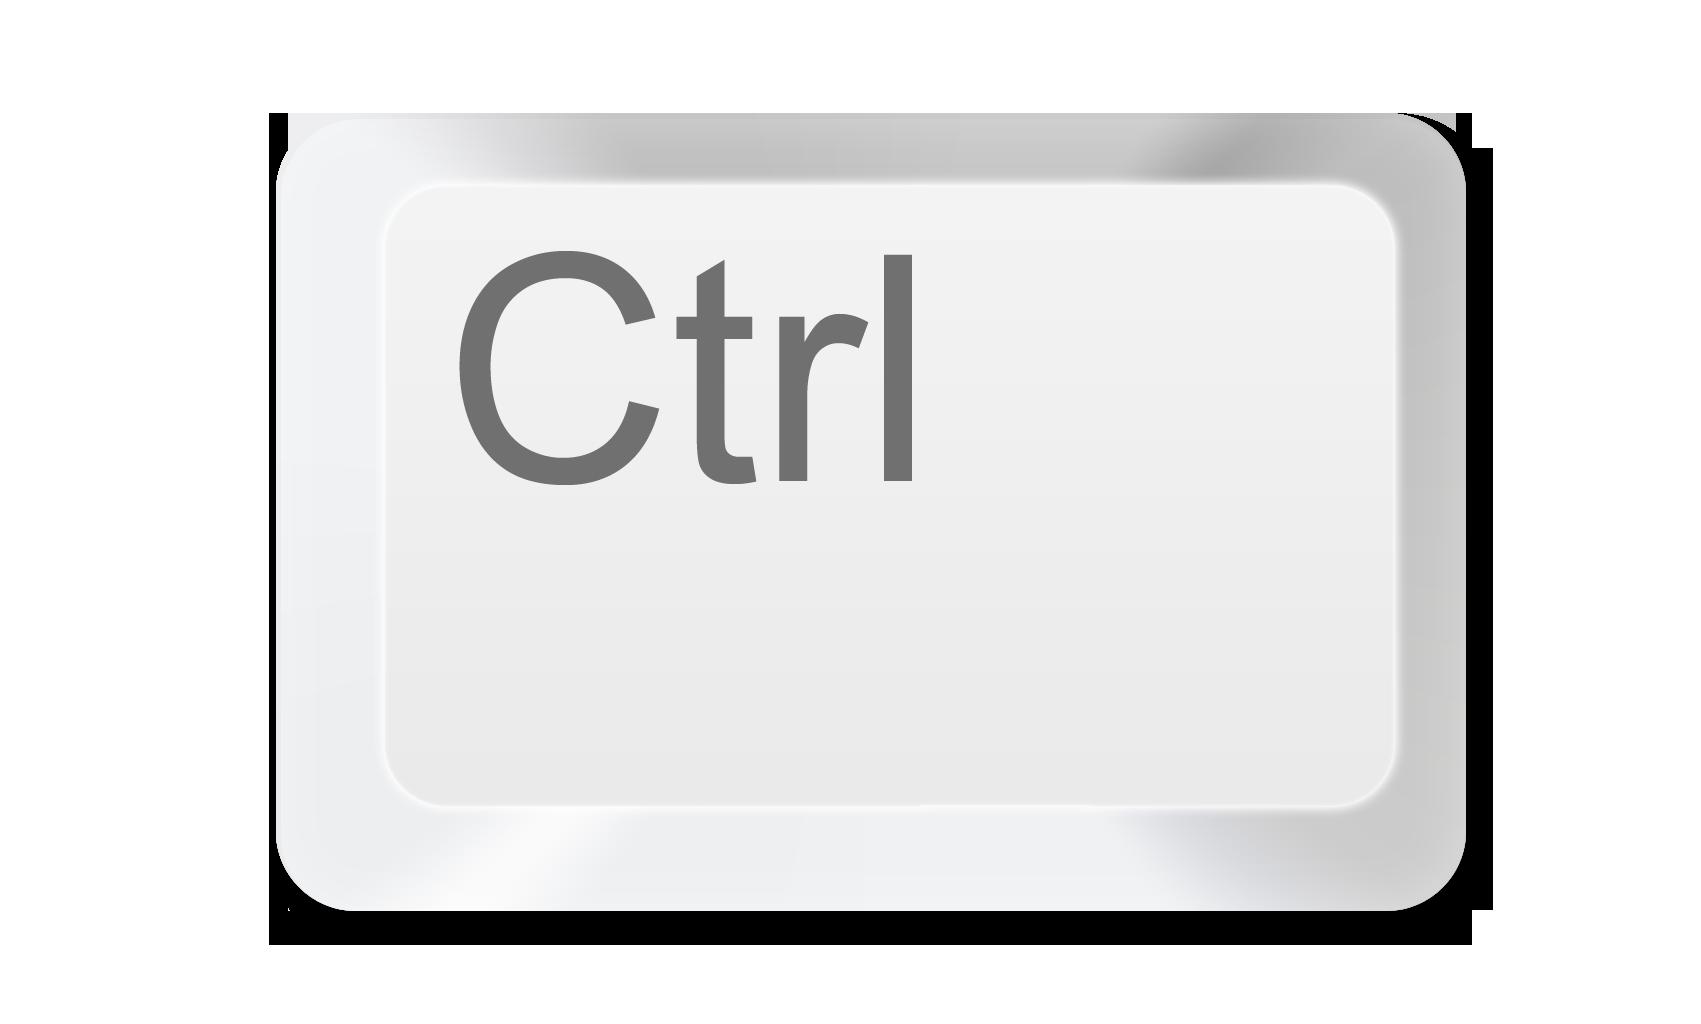 Ctrl Key PNG - 133350